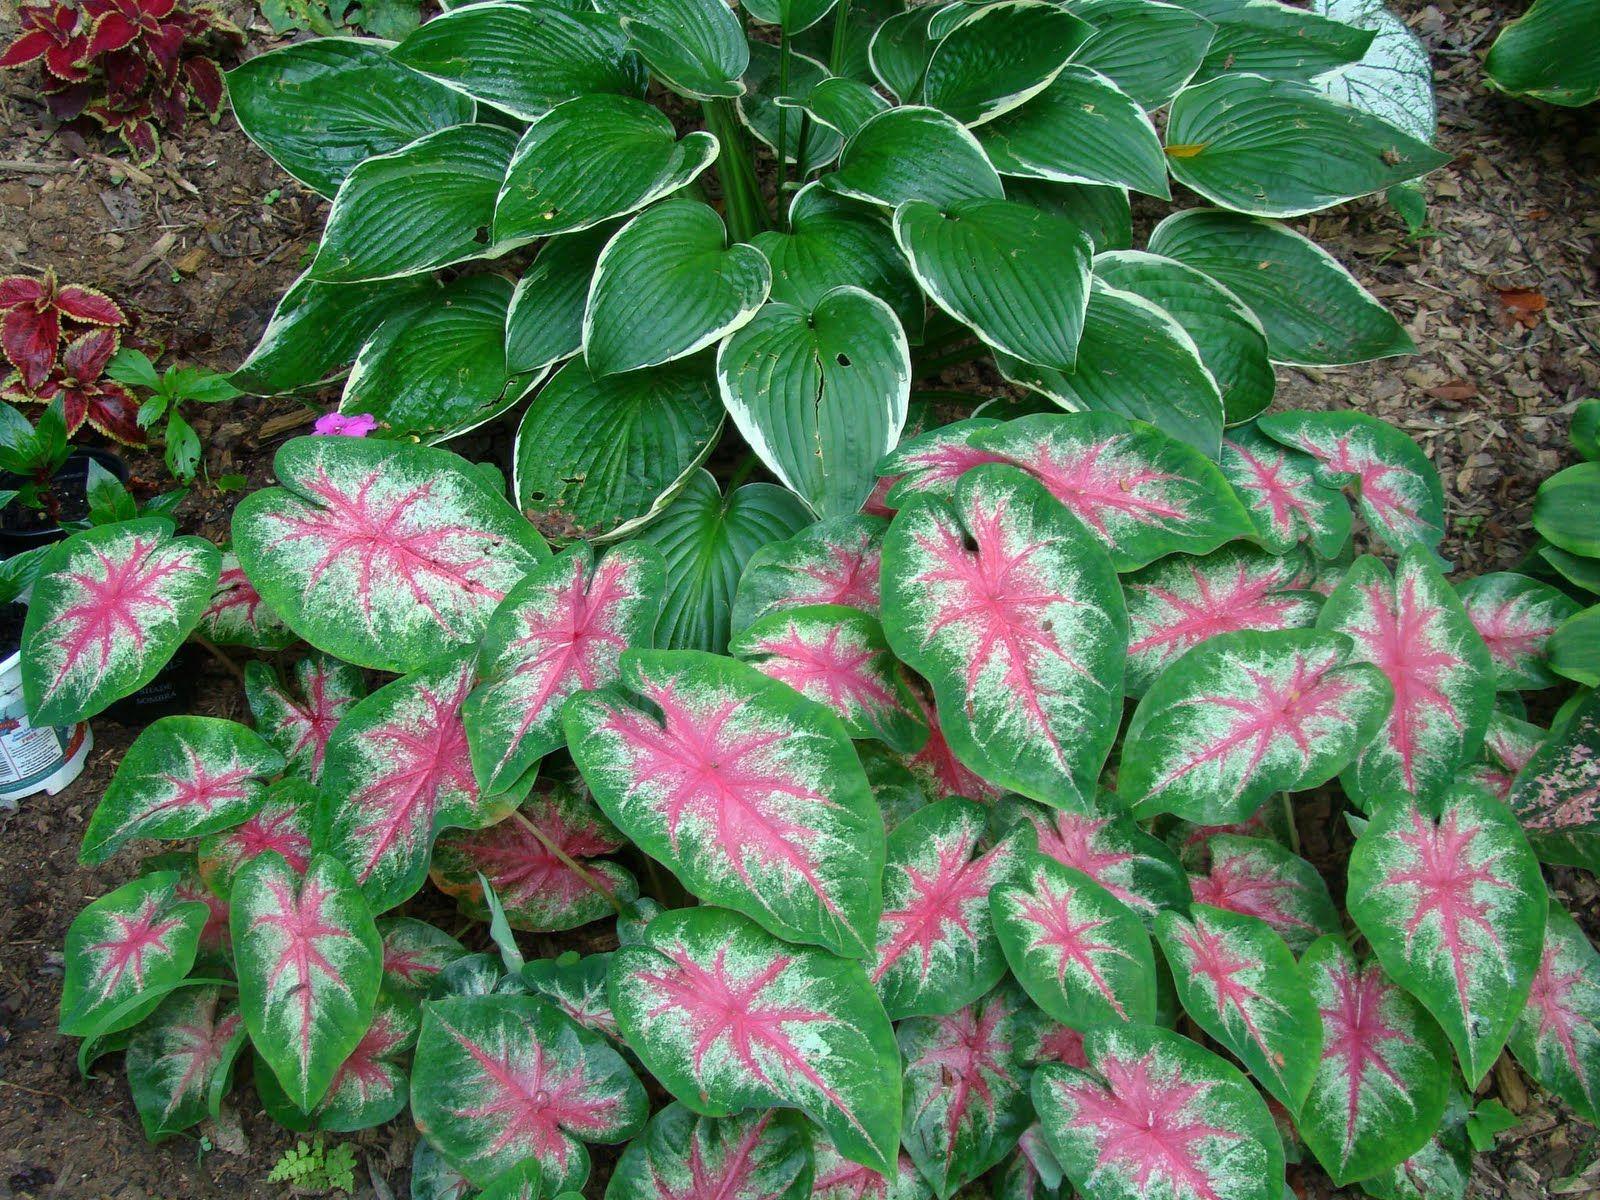 Caladium Pictures Shade Plants Plants Hosta Gardens